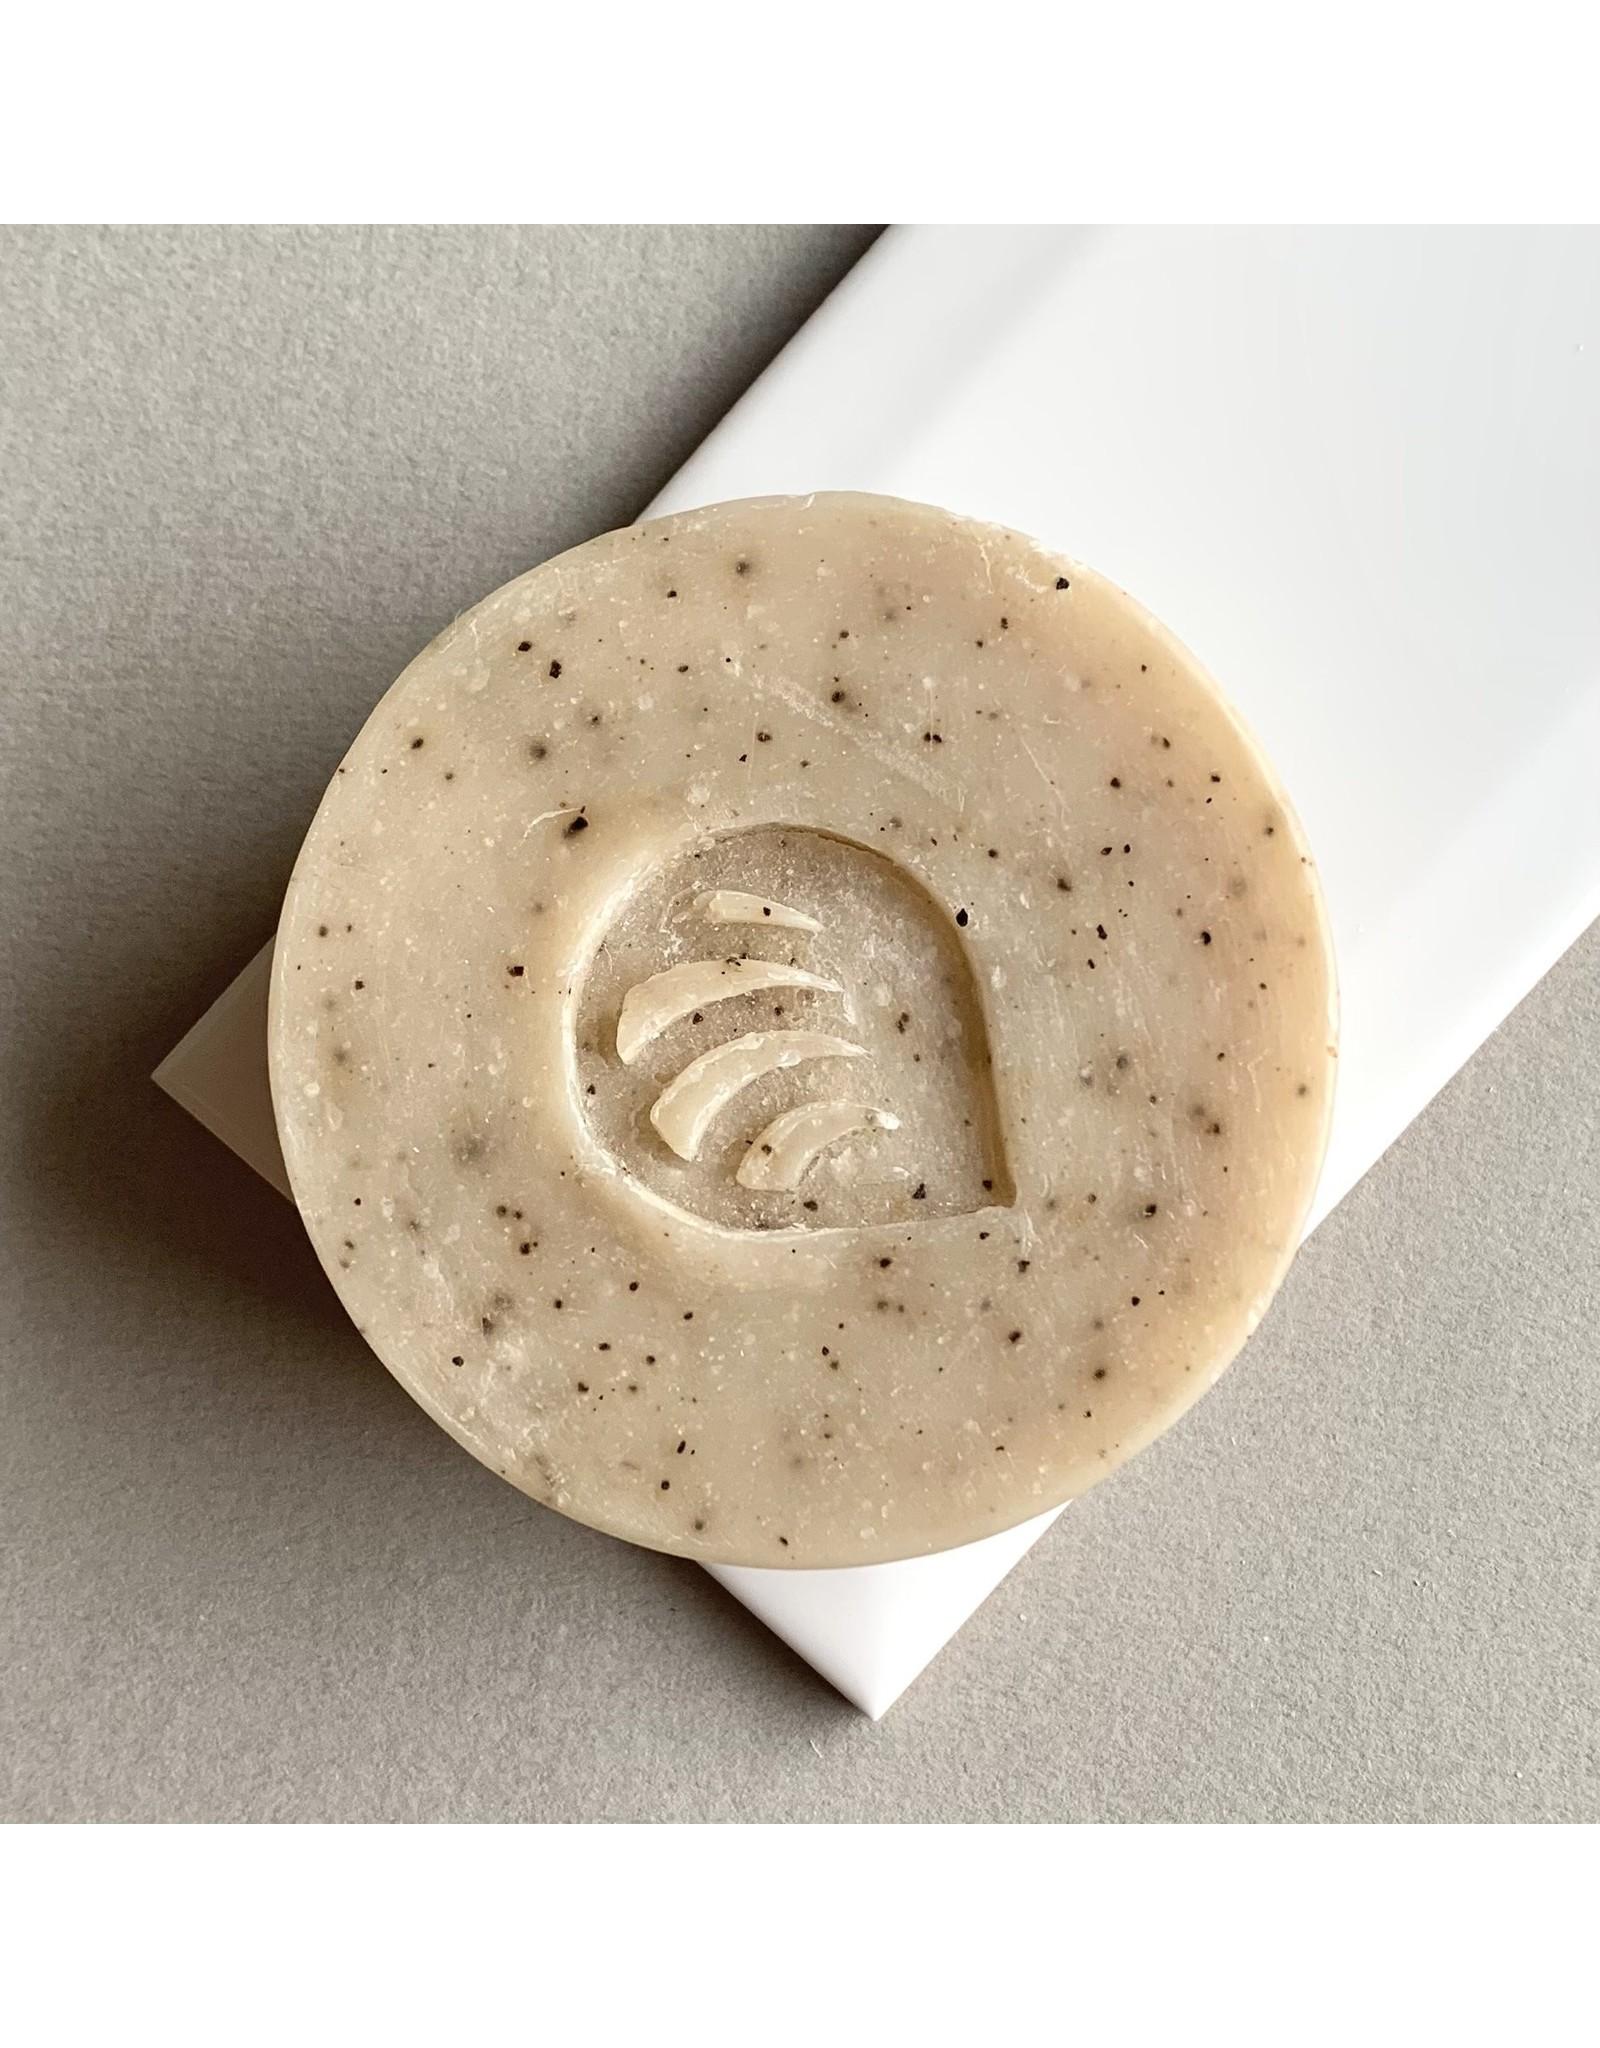 Lavami Hand & Body Soap by Lavami